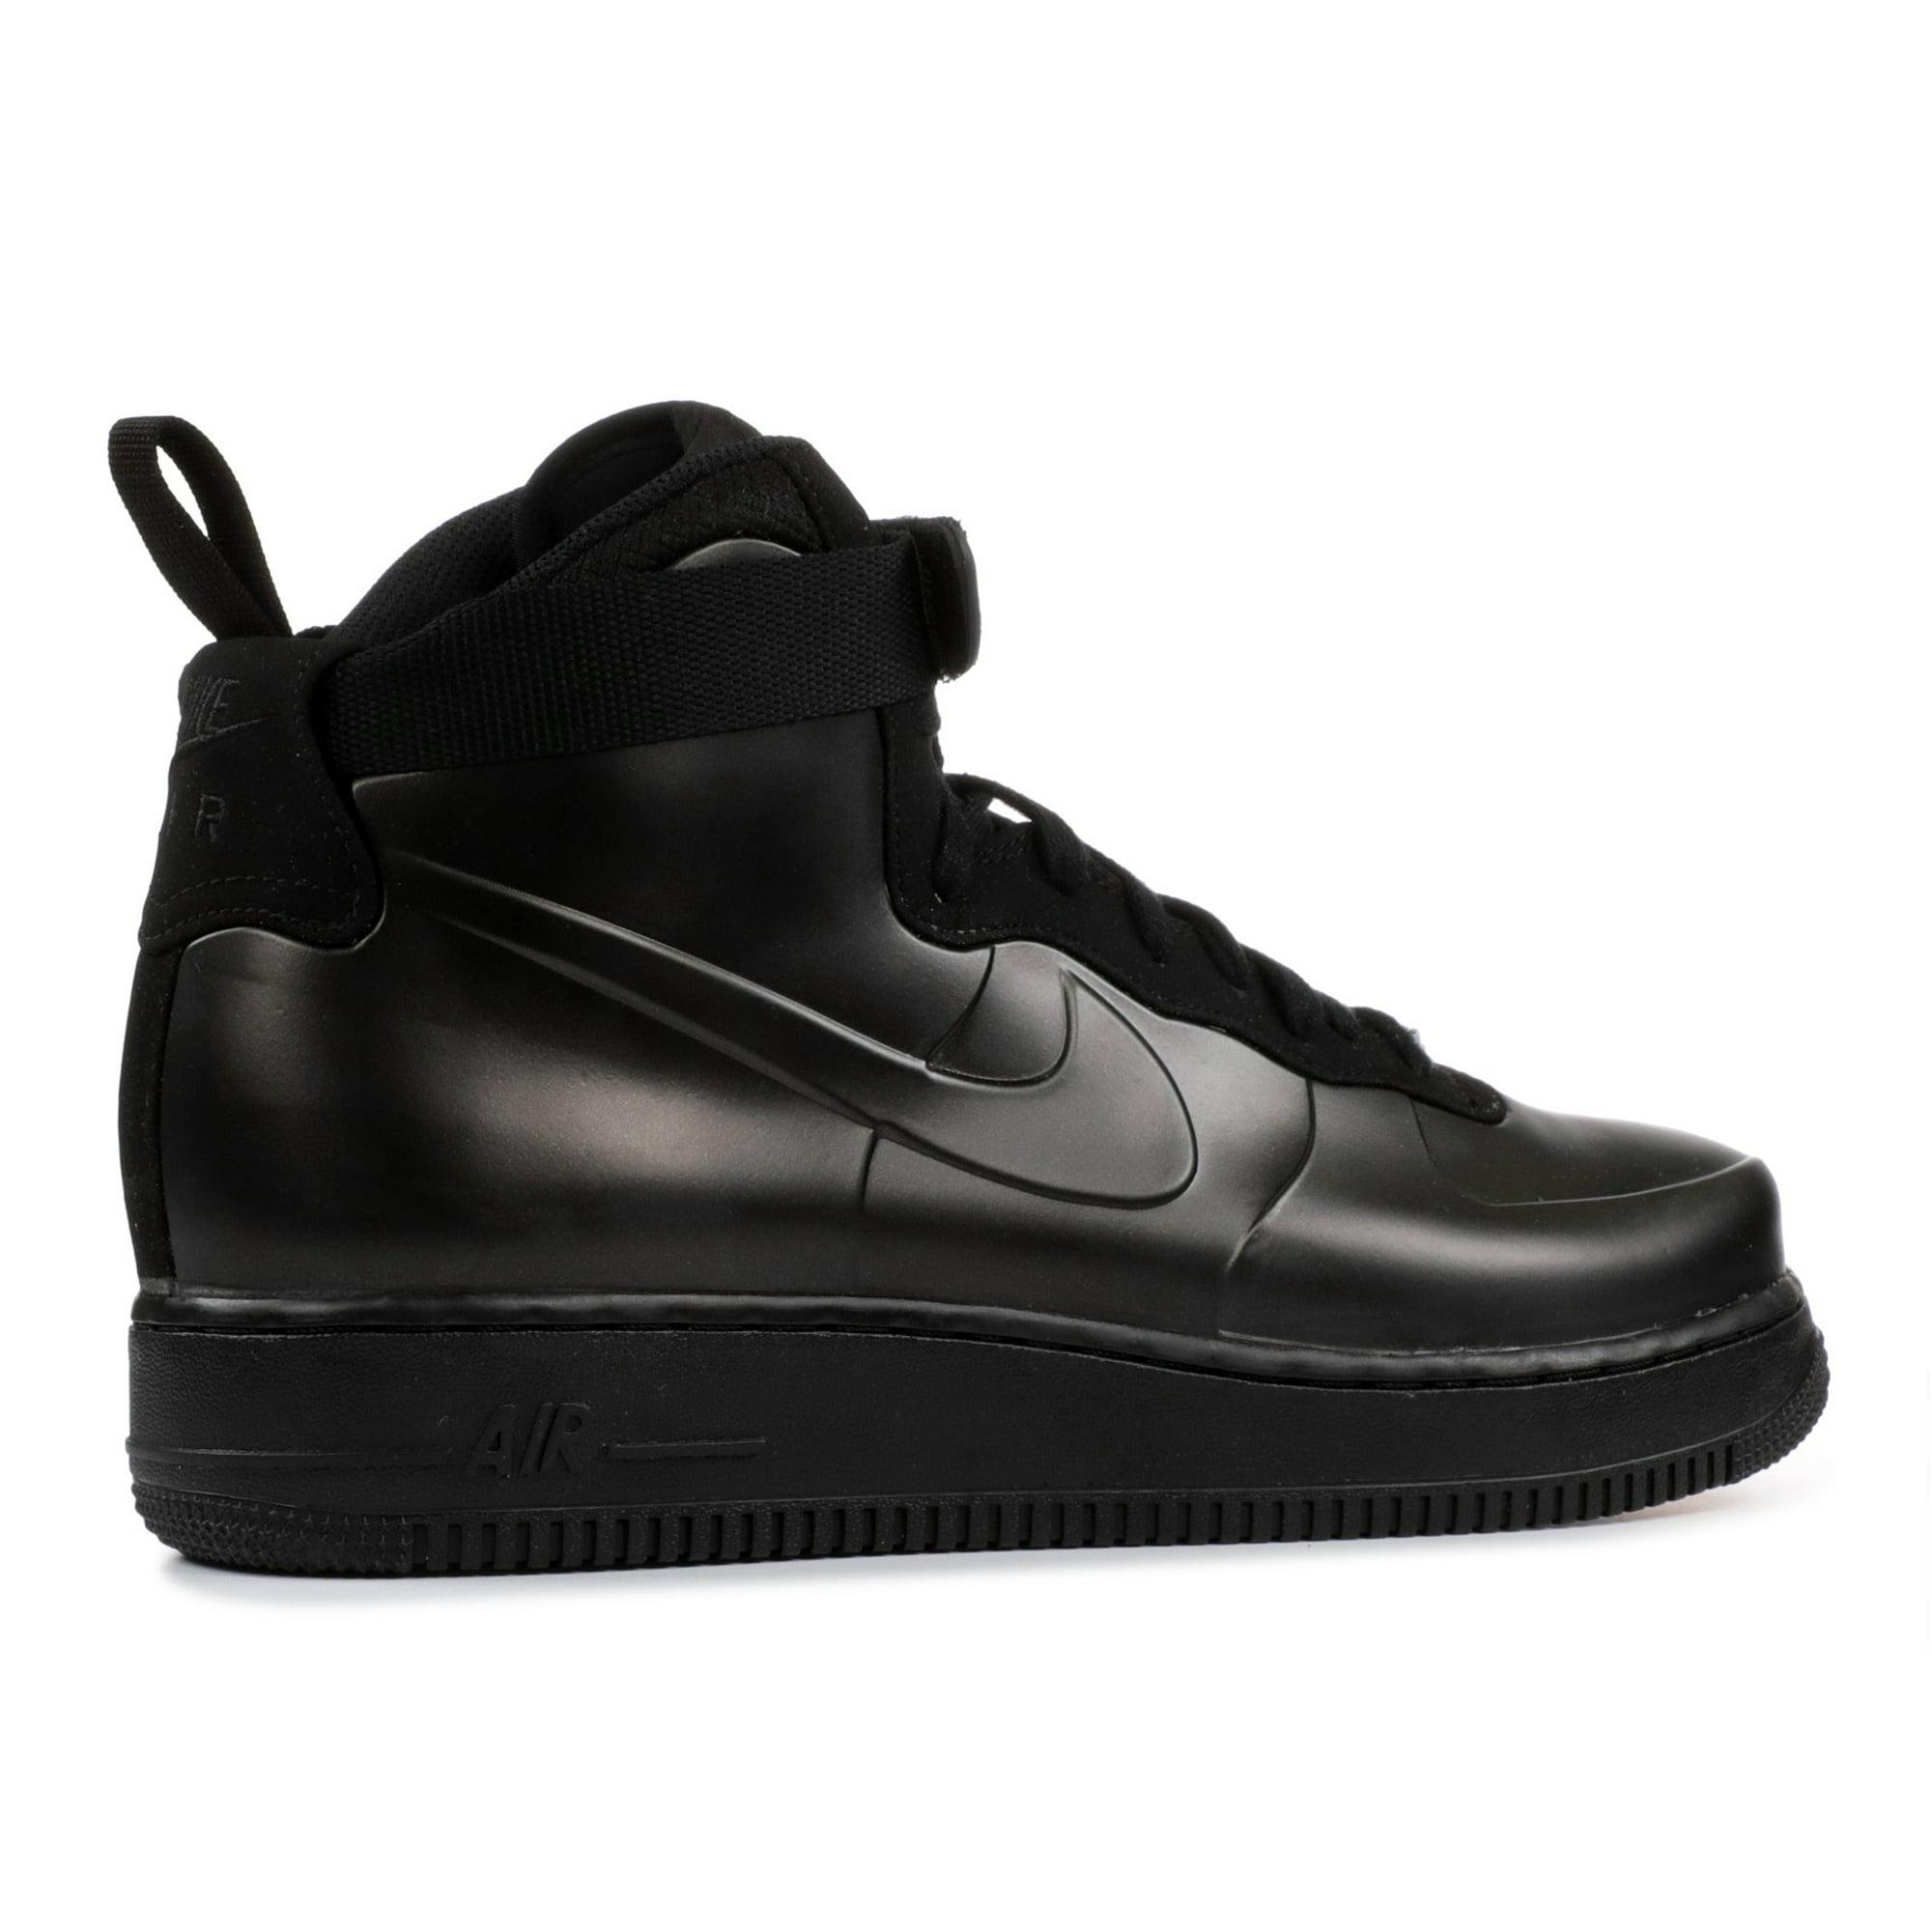 finest selection 4cce8 00e53 Nike - Men - Air Force 1 Foamposite Cup  Triple Black  - Ah6771-001 - Size  13   Walmart Canada